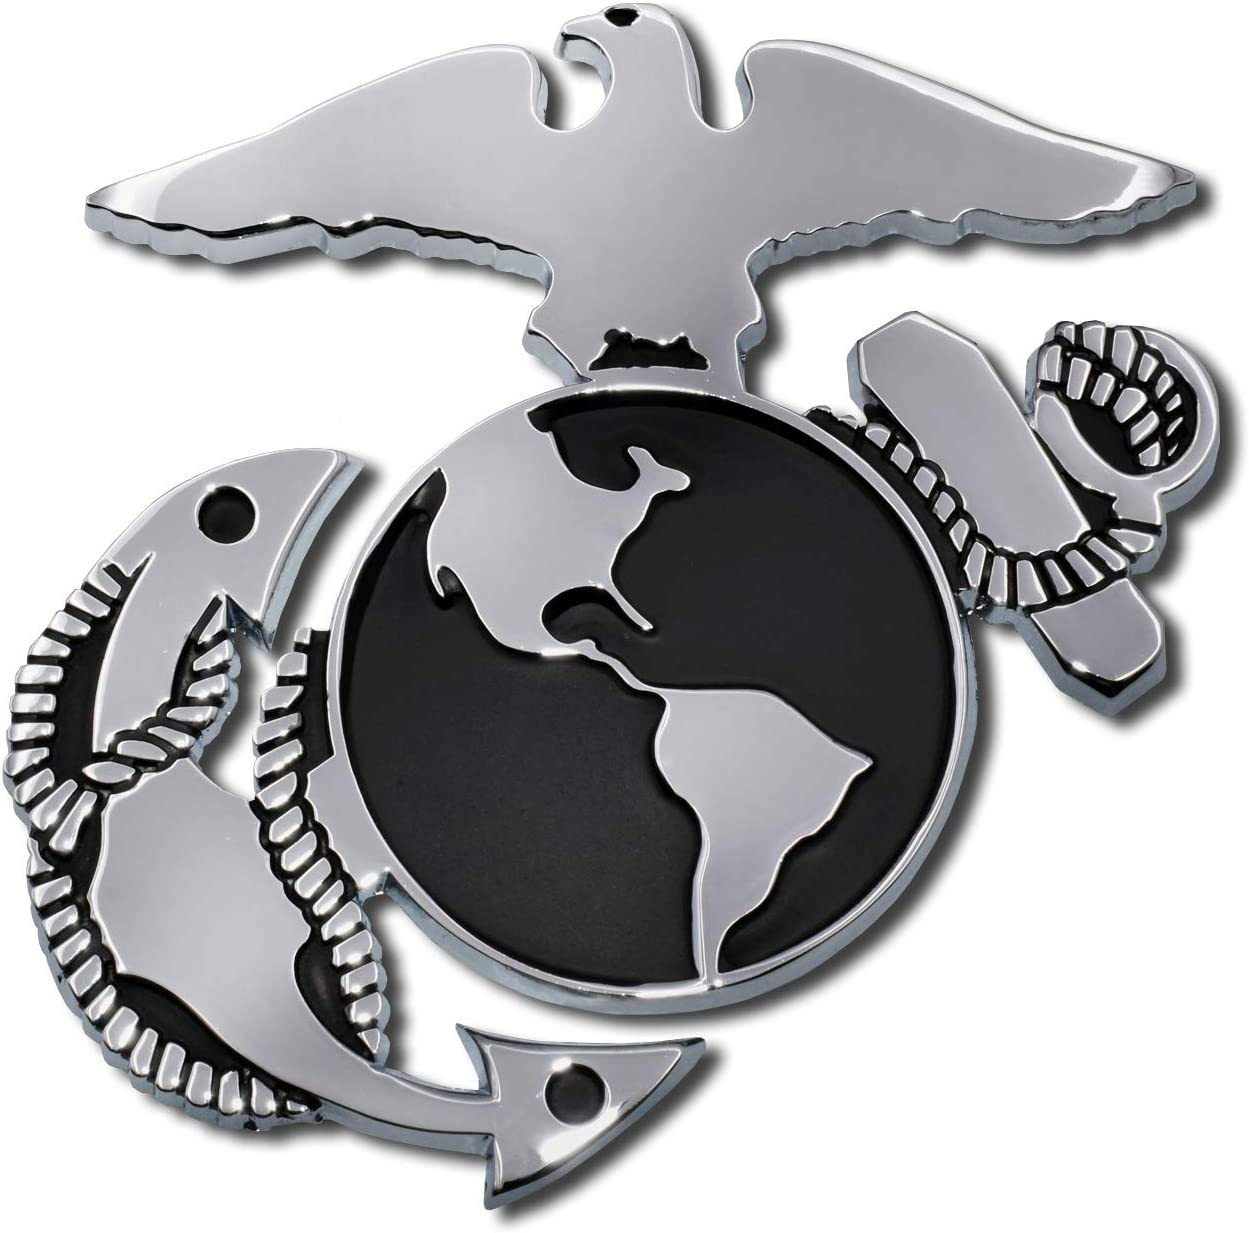 Elektroplate Marines Anchor Chrome Auto Emblem